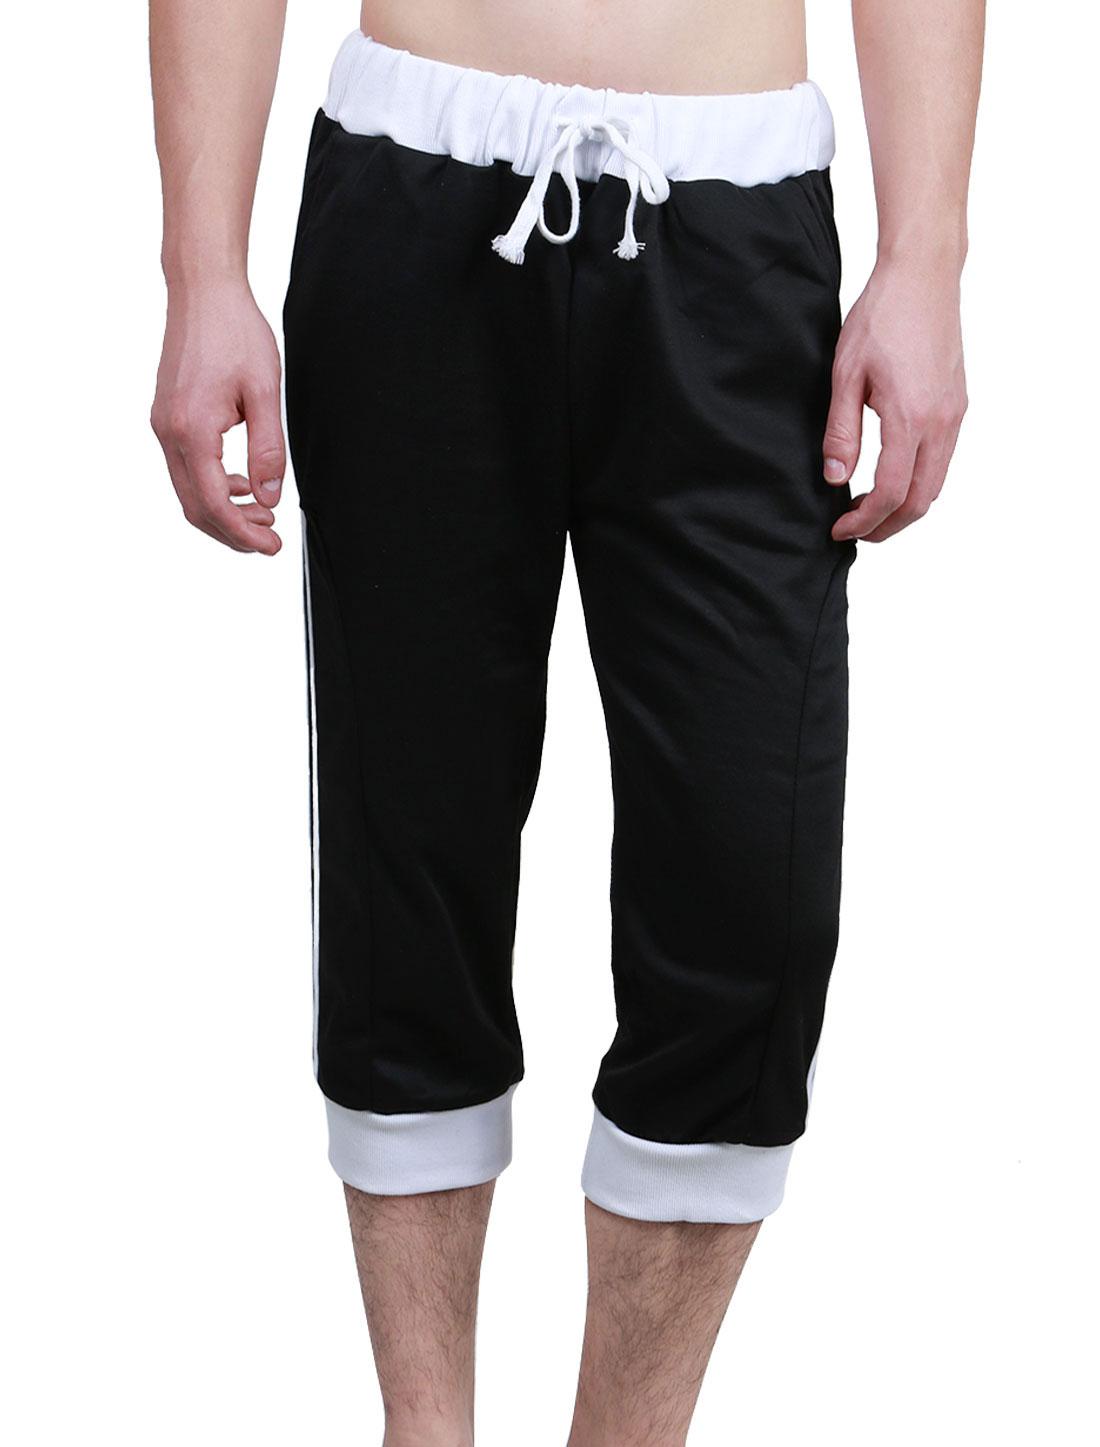 Men Elastic Waist Pockets Casual Short Sport Pants Black White W28